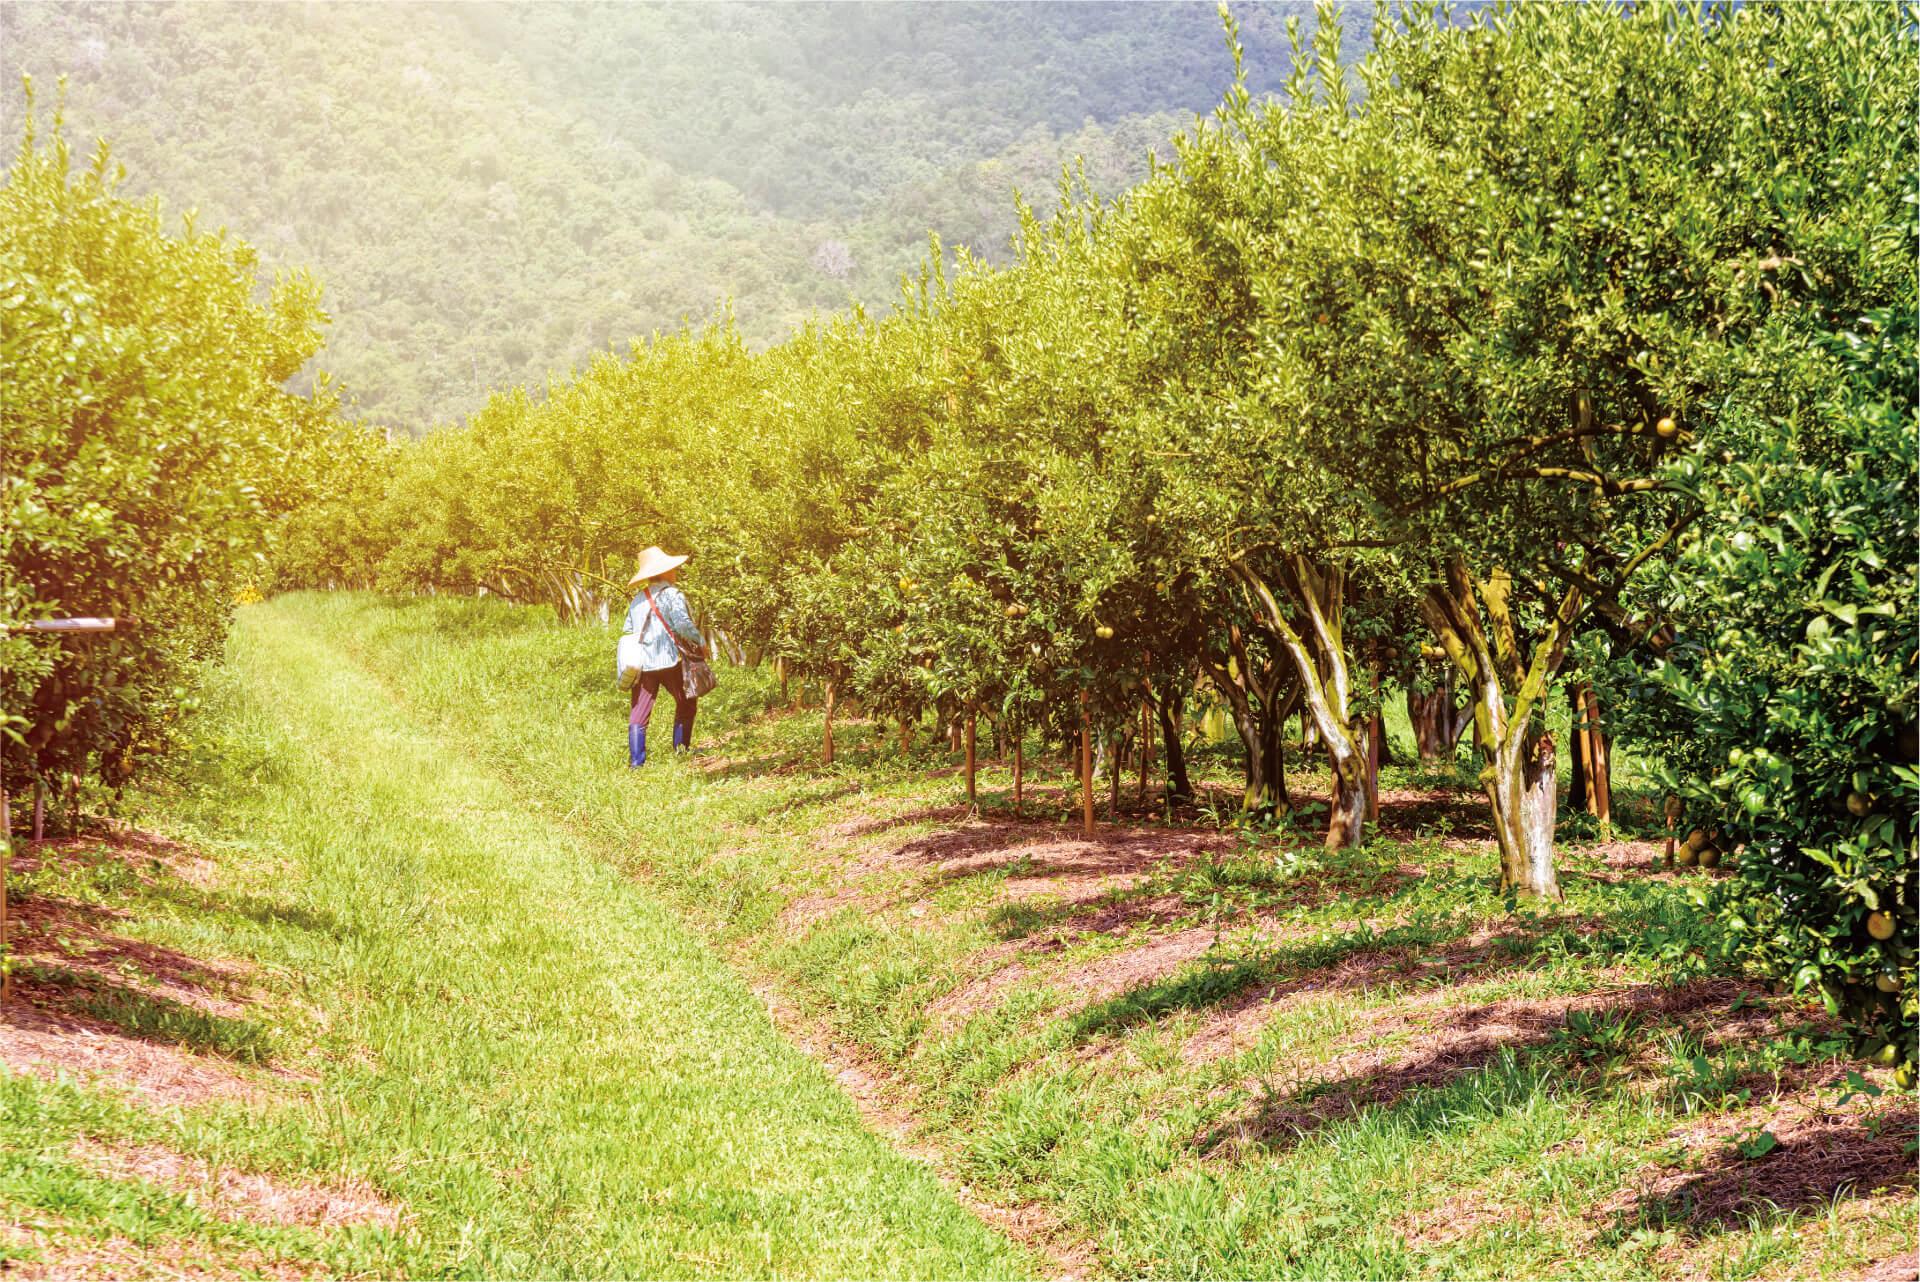 GRANBLACK-Fertilizante-Foliar-Organomineral-Premium-Imagem-de-Fundo-Laranjal.jpg